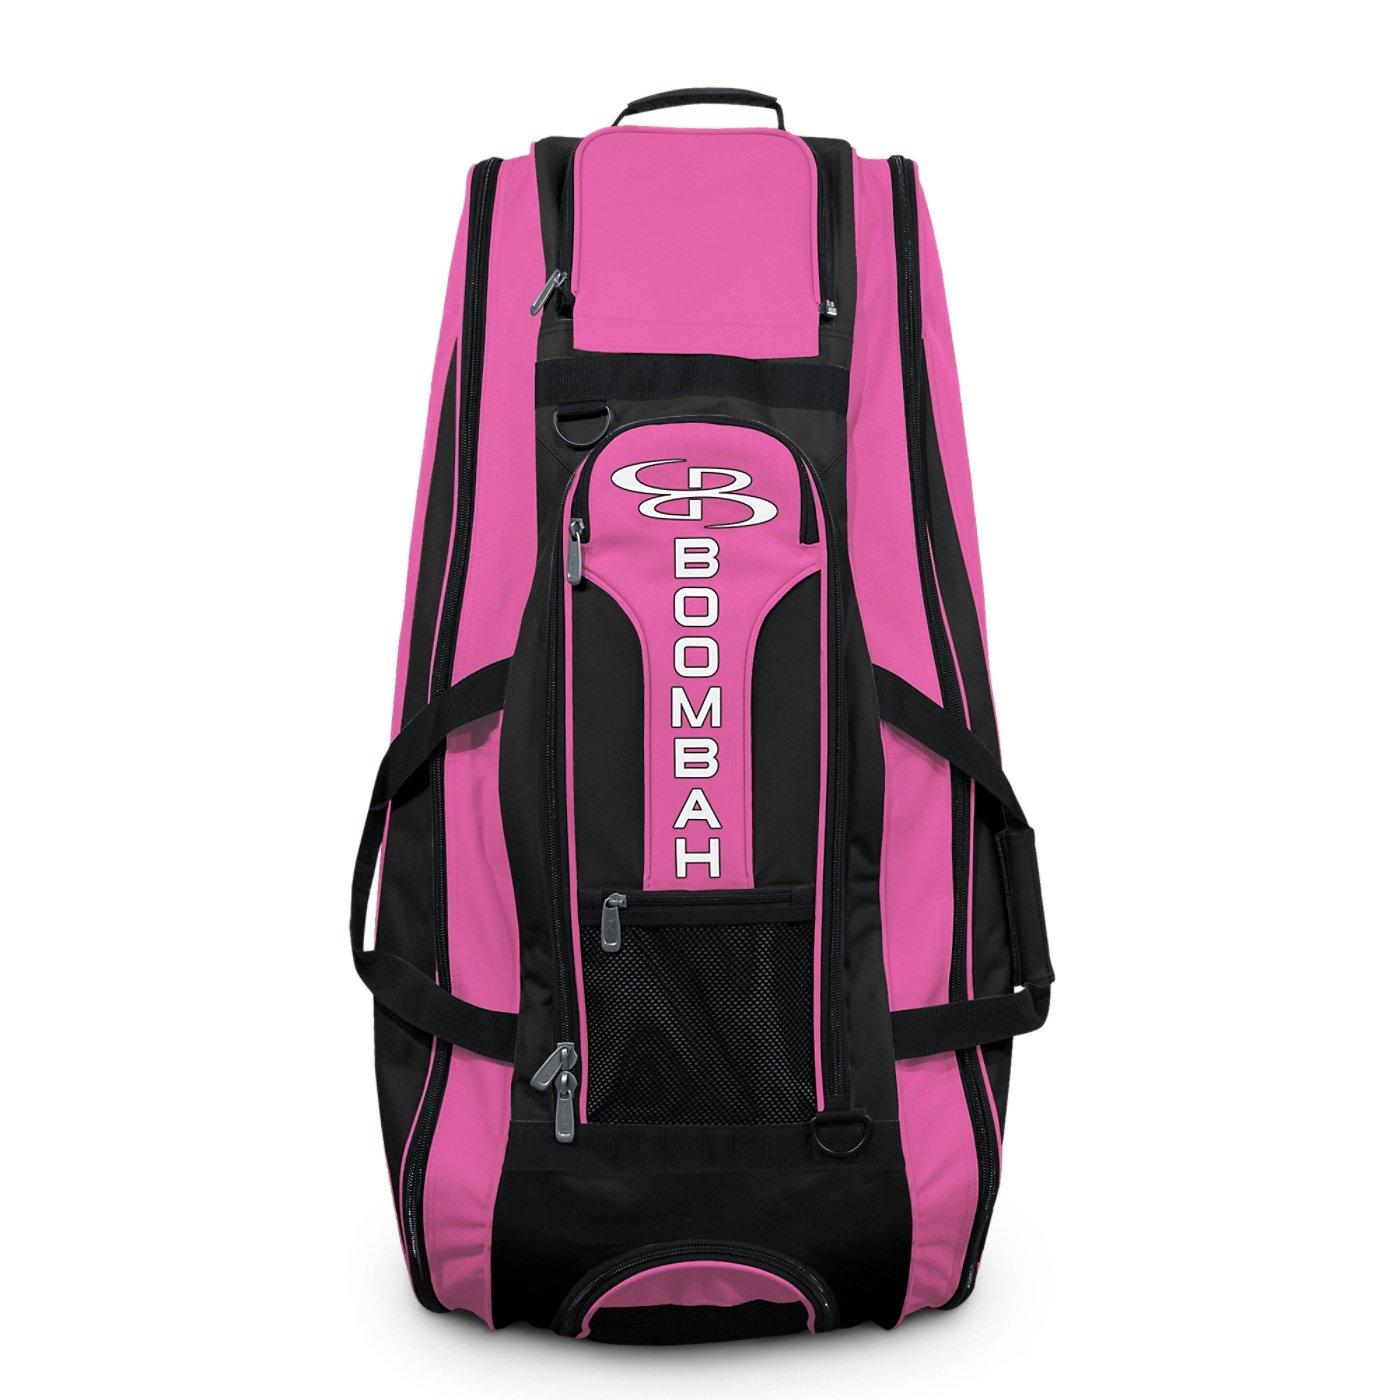 Boombah Beast Baseball/Softball Bat Bag - 40'' x 14'' x 13'' - Black/Pink - Holds 8 Bats, Glove & Shoe Compartments by Boombah (Image #3)